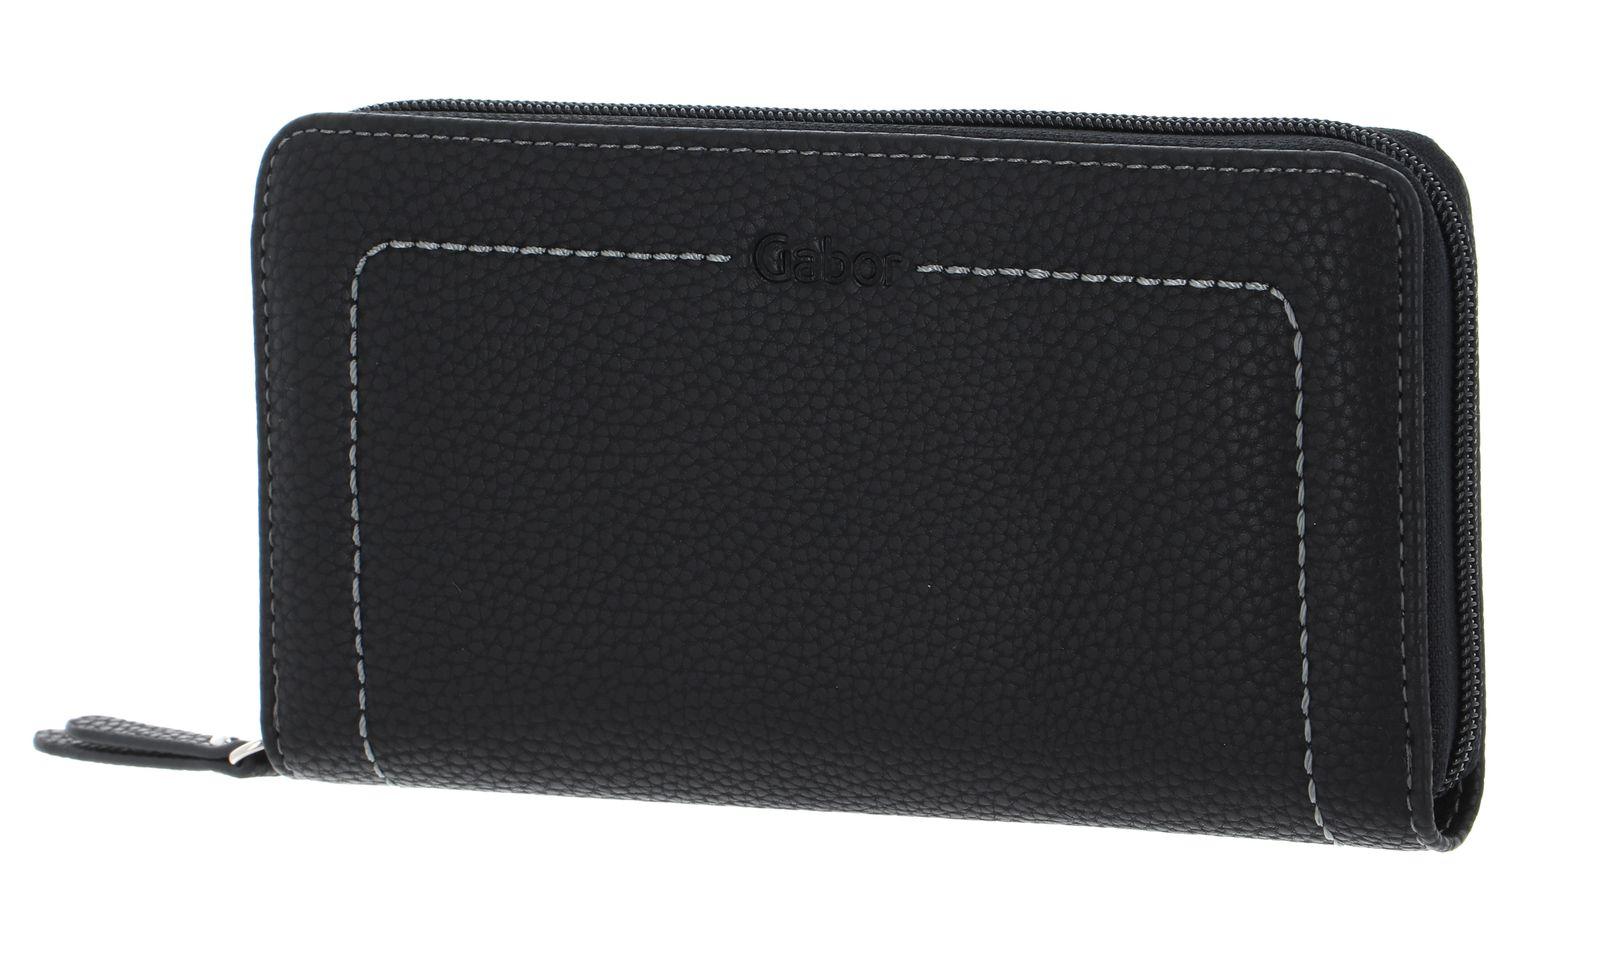 Gabor Alanna Long Zip Wallet Black